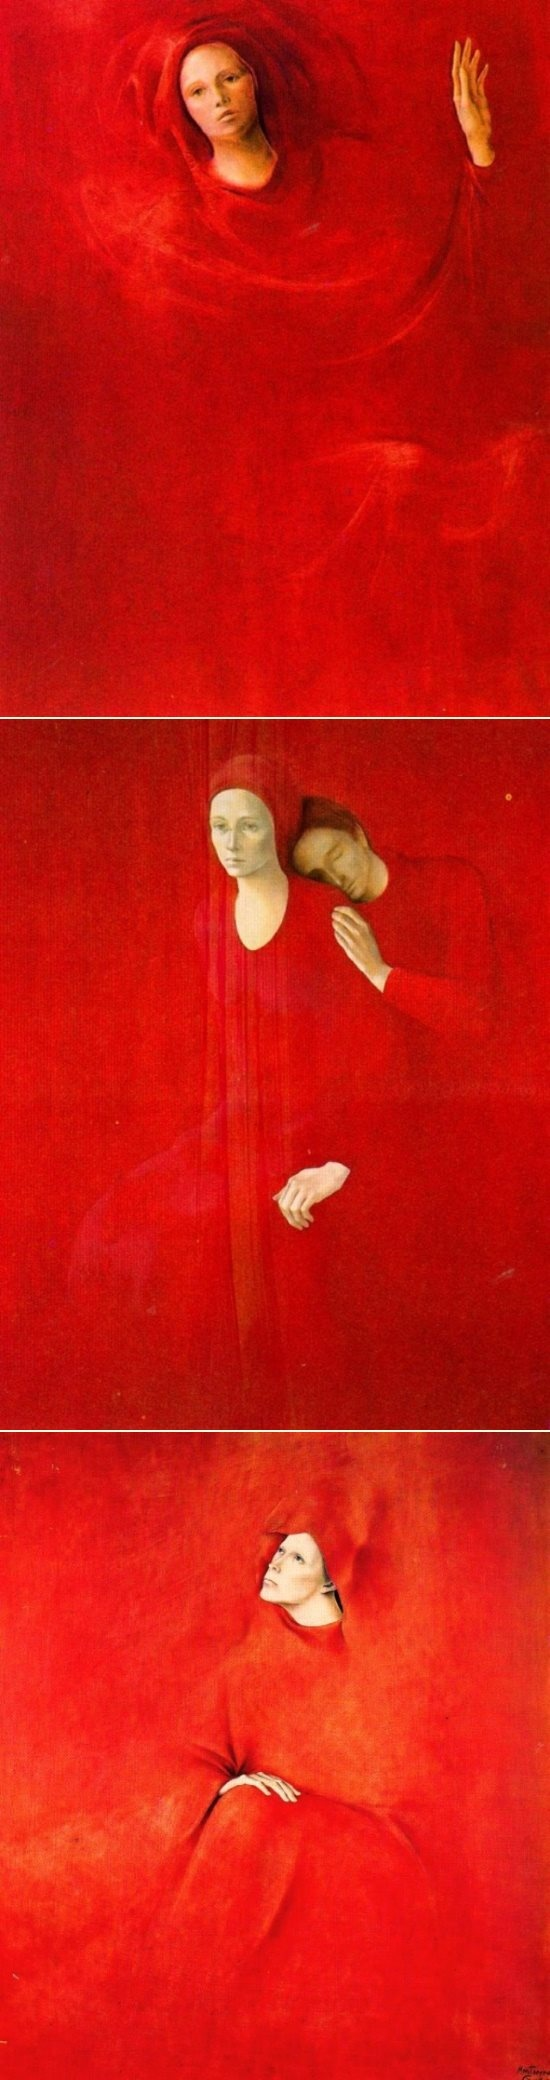 Tres figuras con fondo rojo.